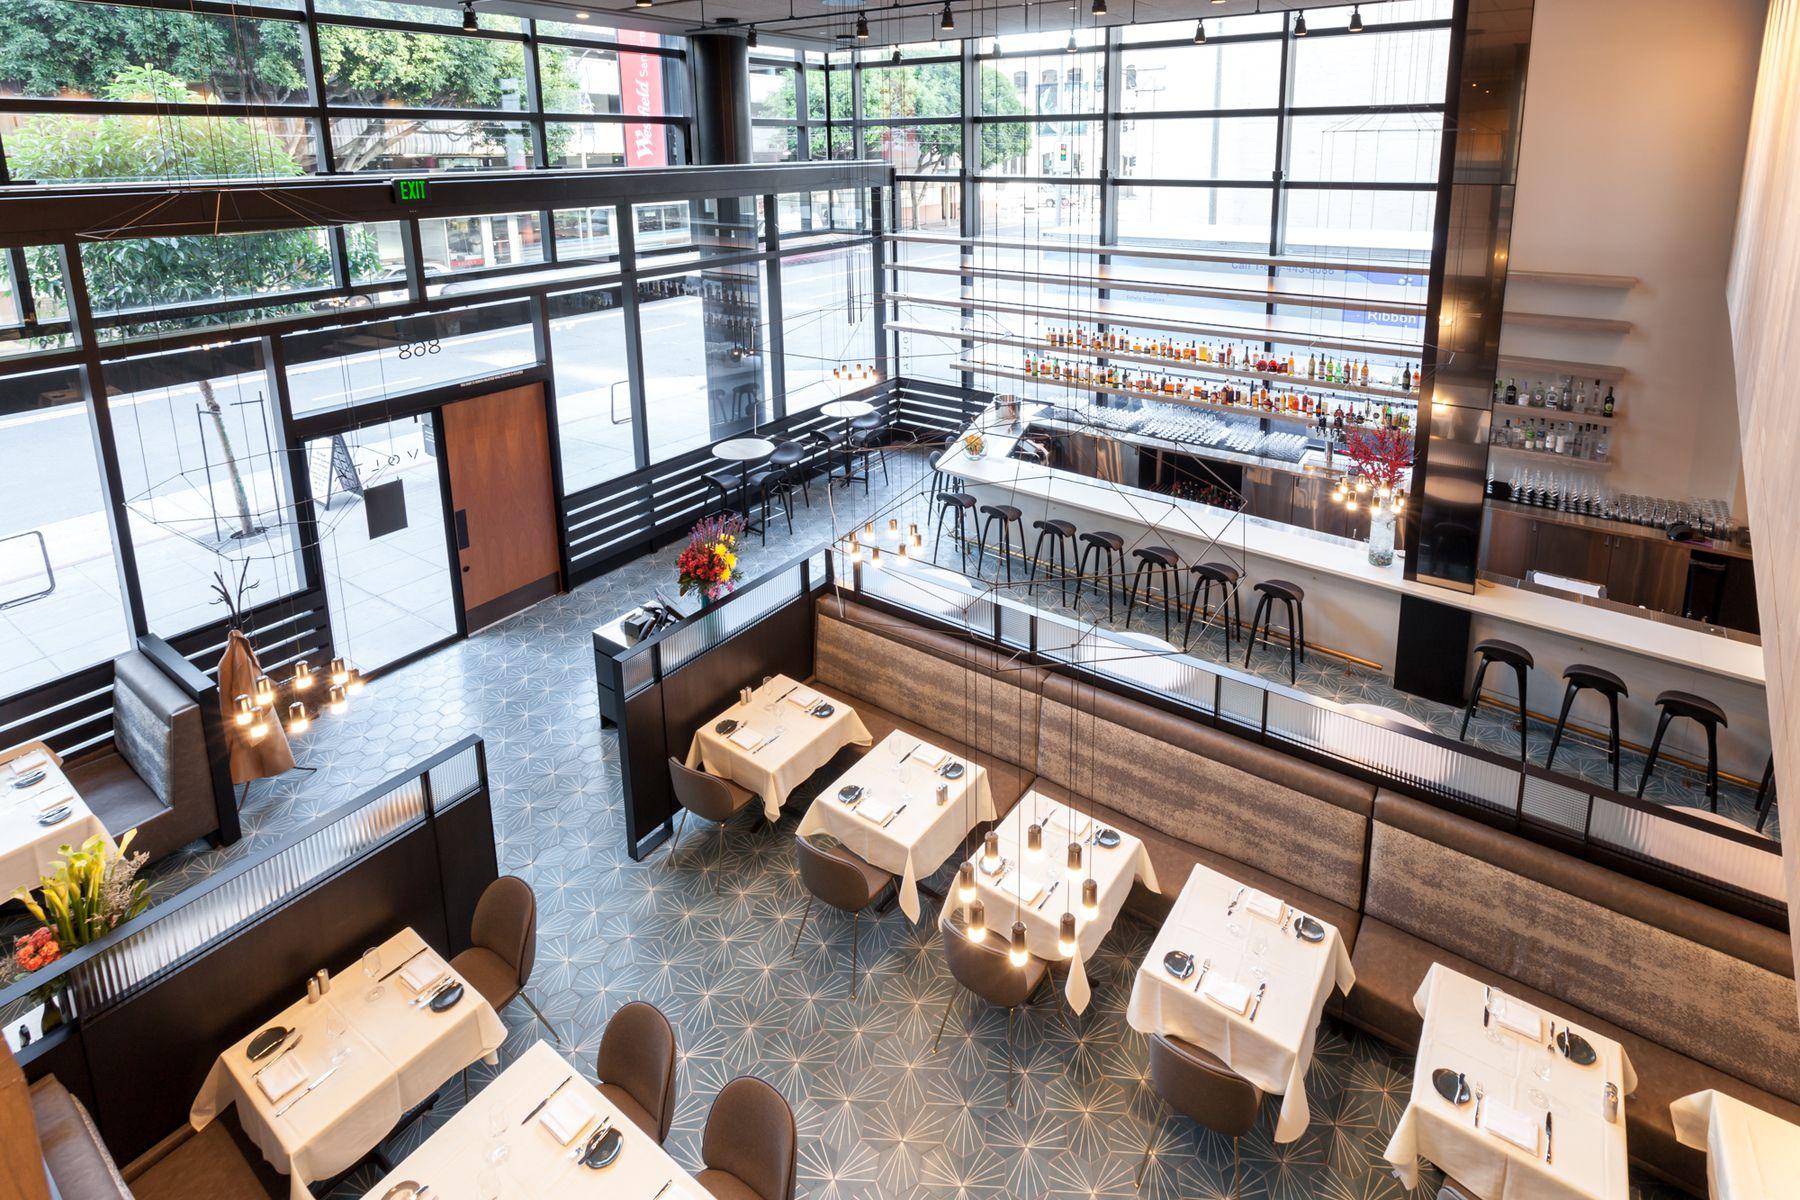 San Francisco's Most Architecturally Stunning Recent Restaurants